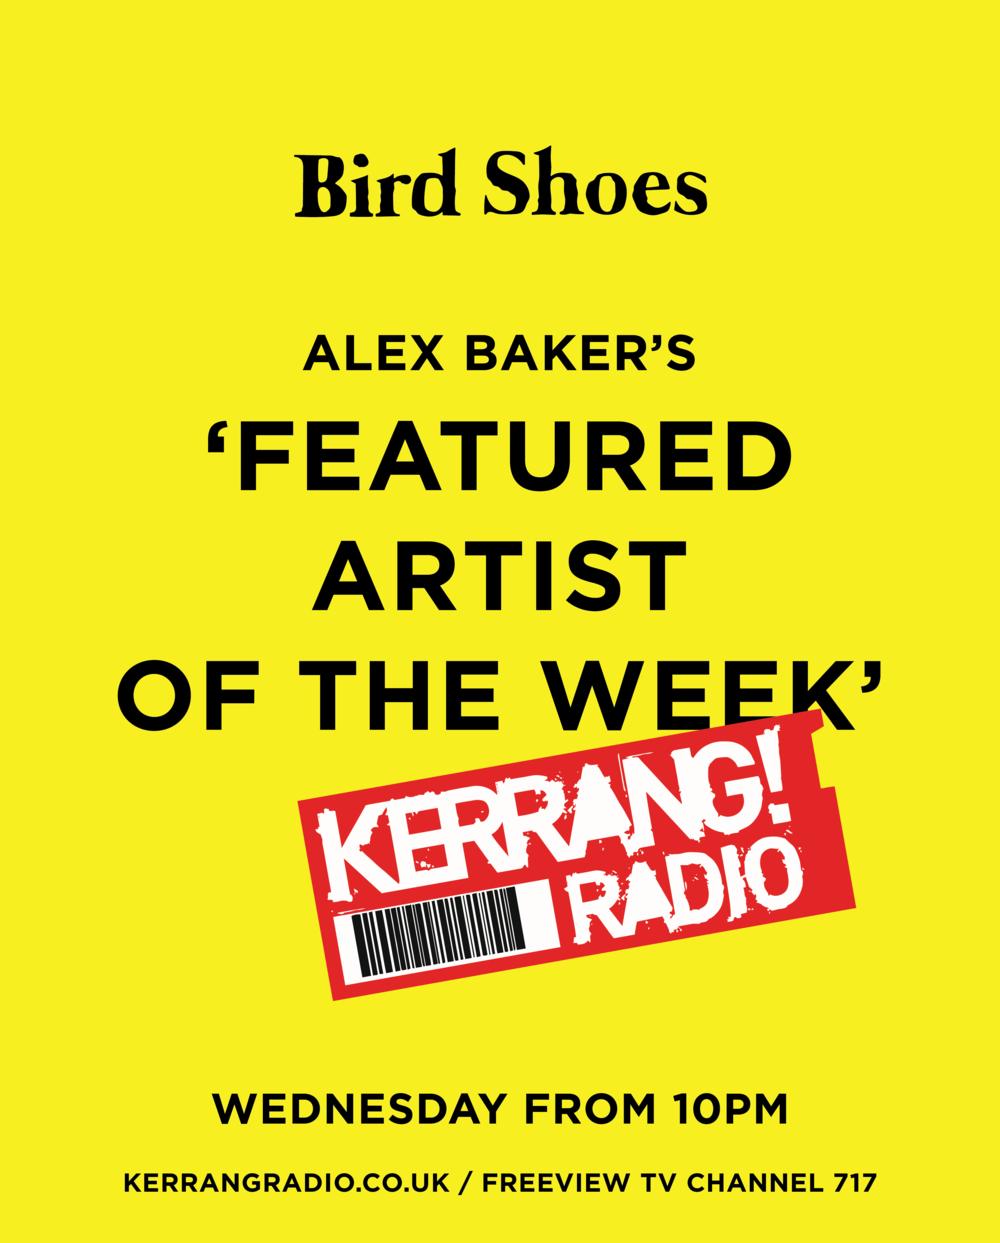 Bird Shoes KERRANG LADS insta post 23rd May.png